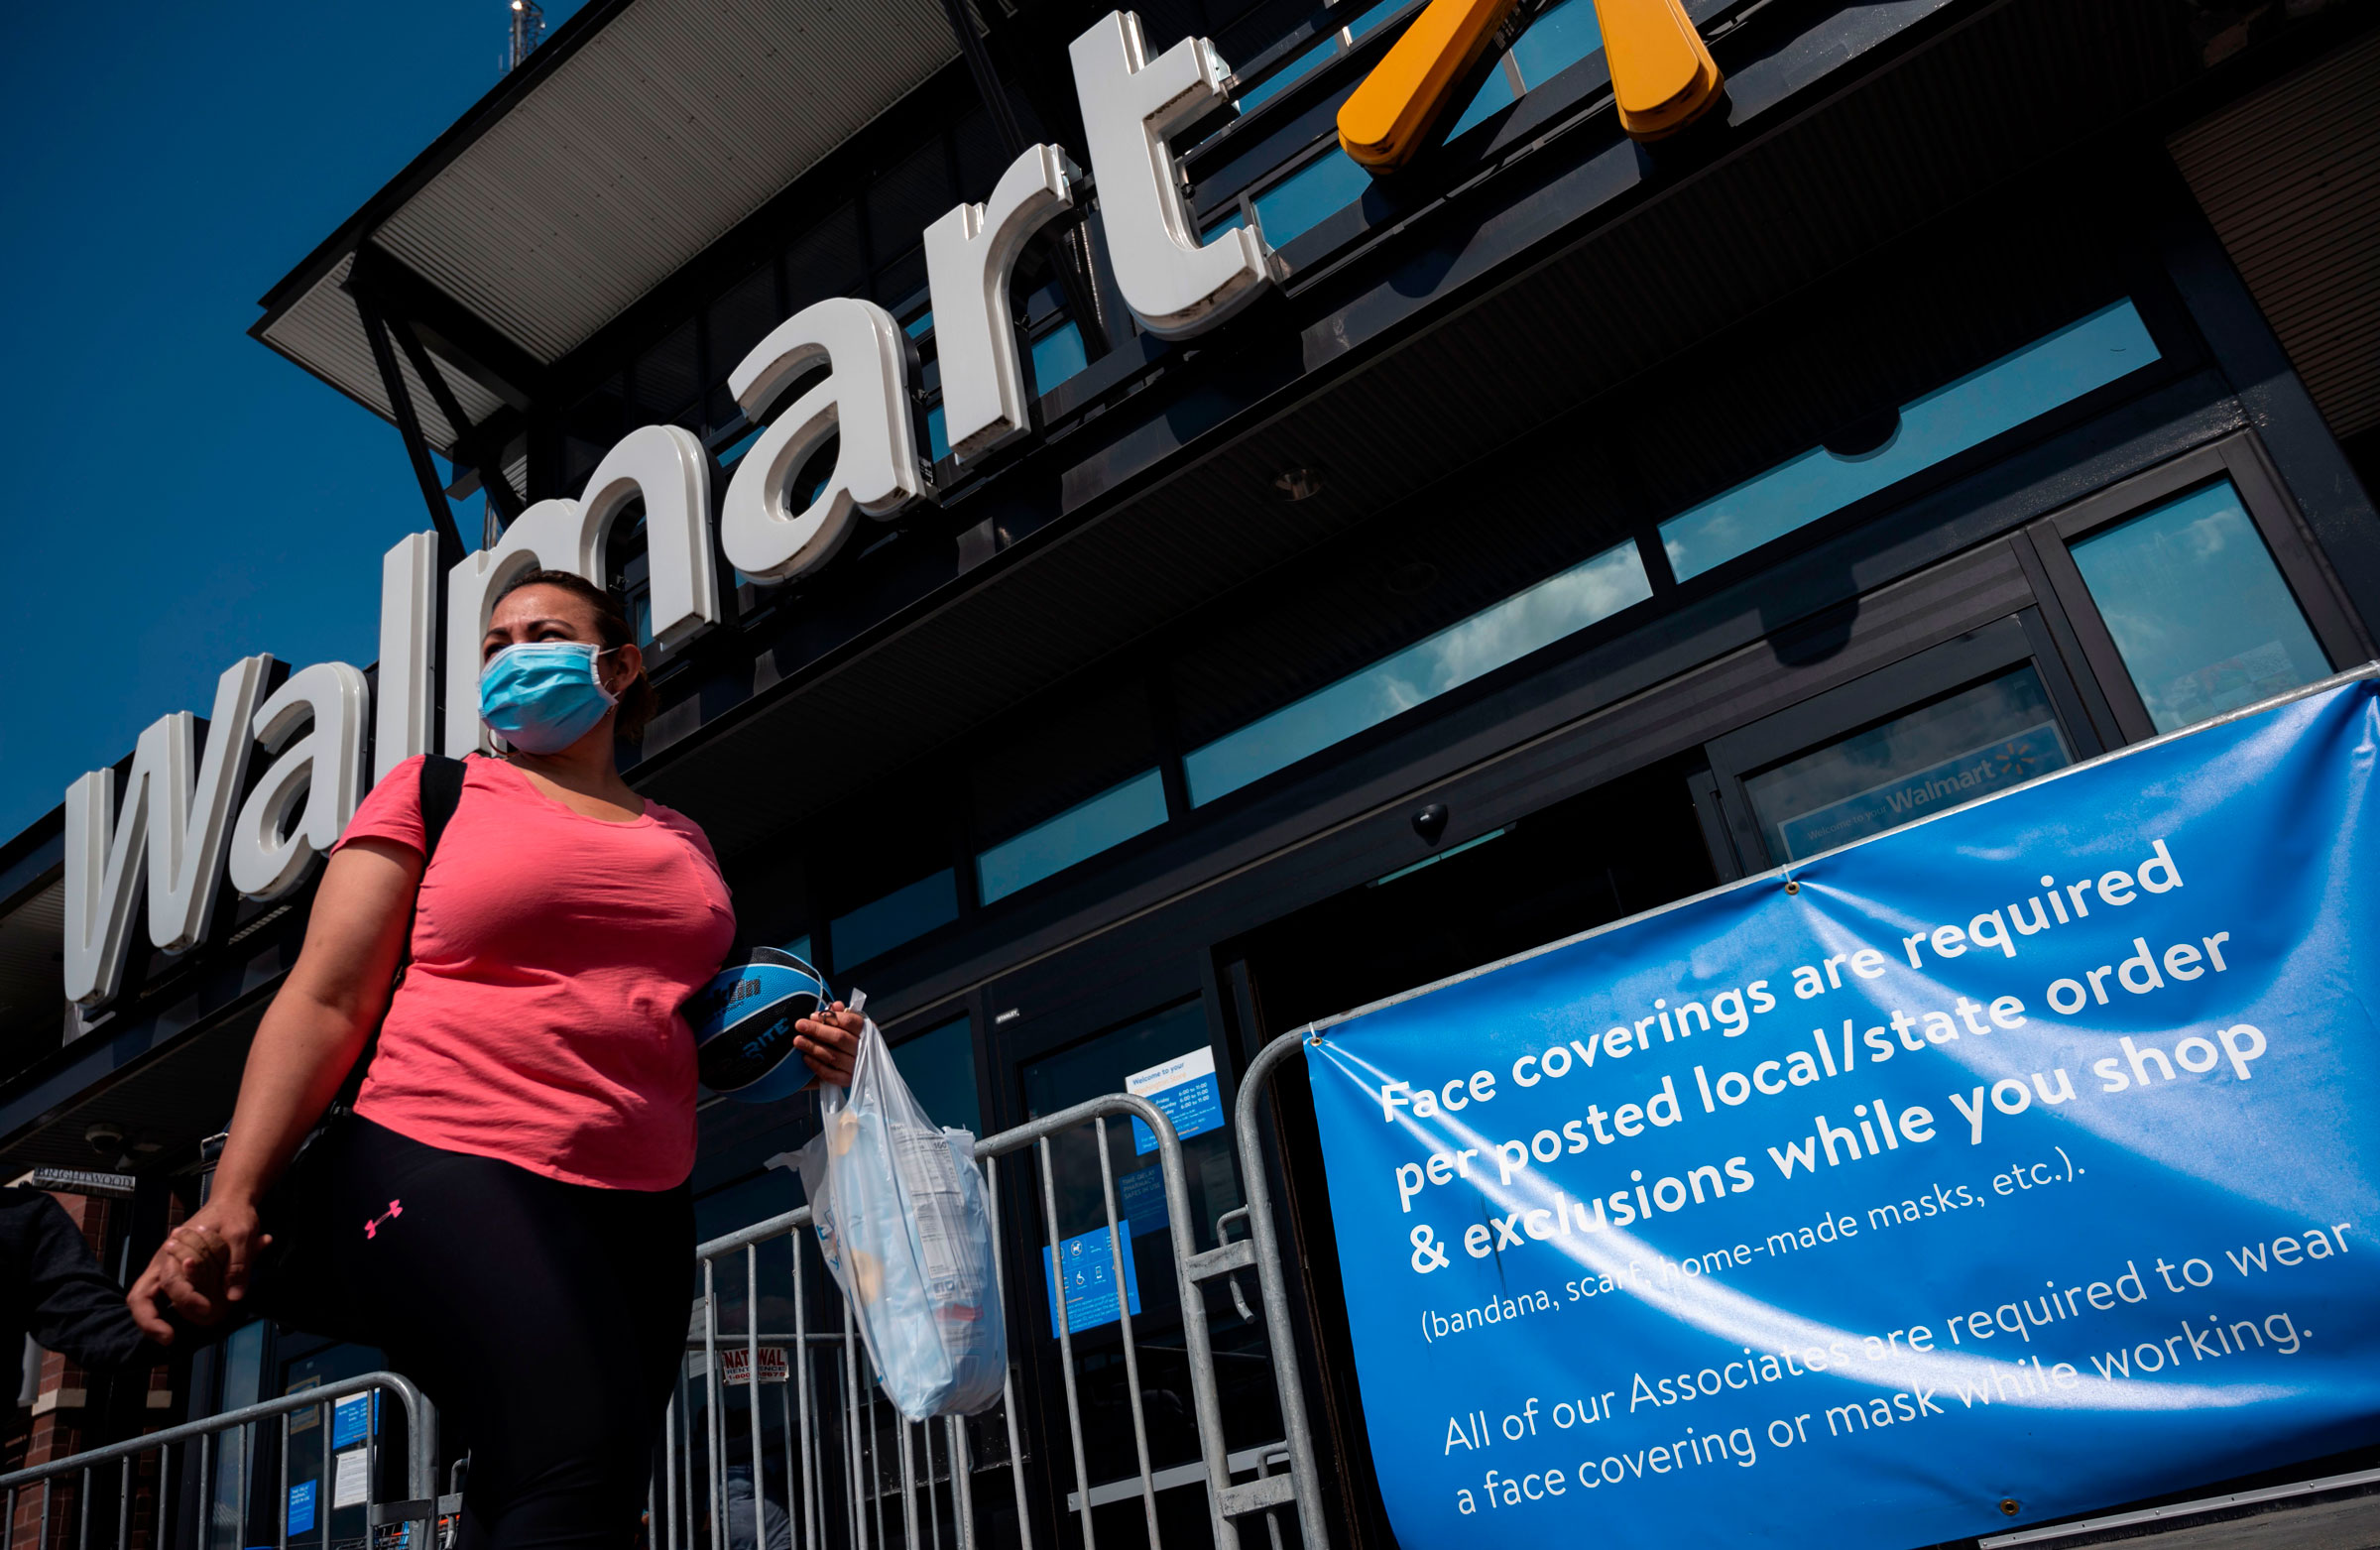 A woman walks outside a Walmart store in Washington, DC, on Wednesday.